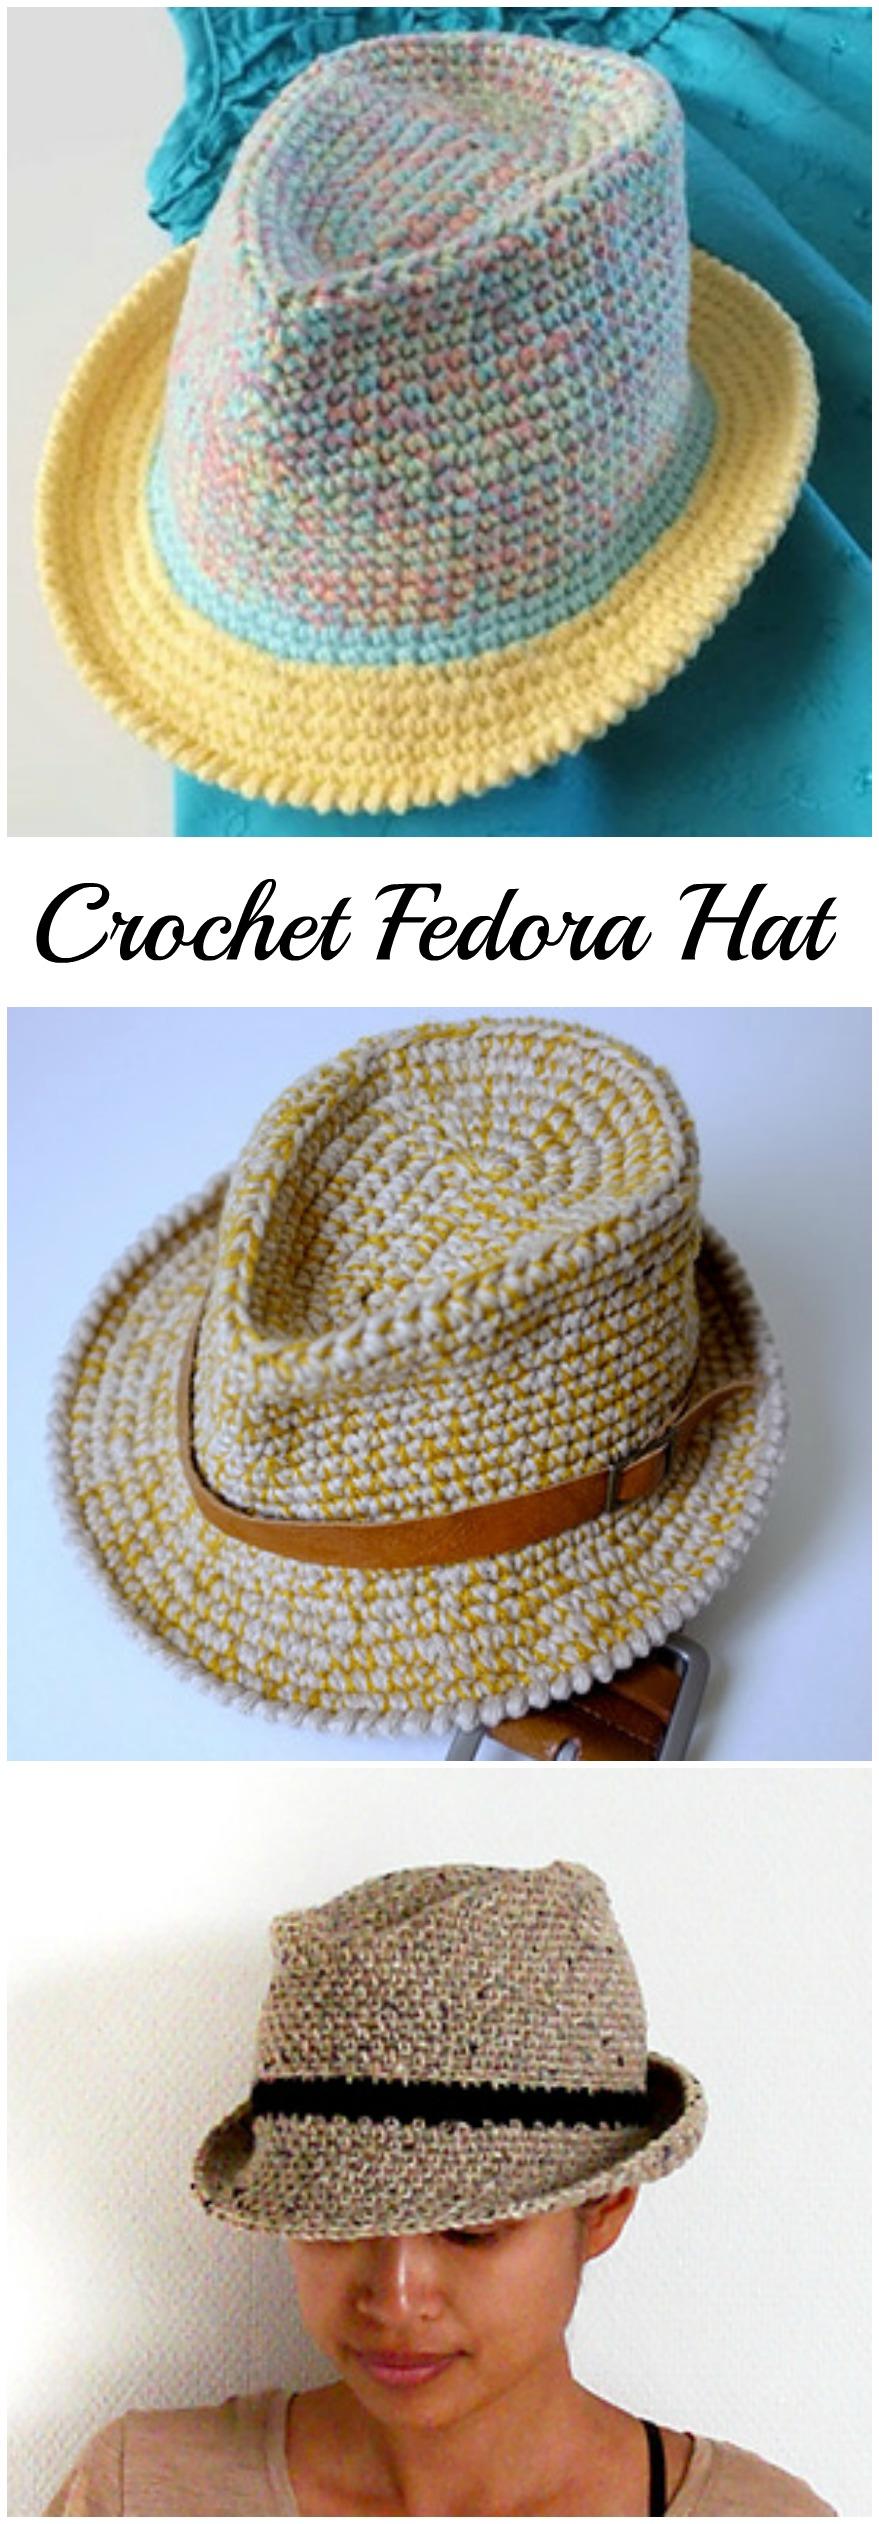 9c42842941a Crochet Fedora Hat (Video+Pattern) - Pretty Ideas